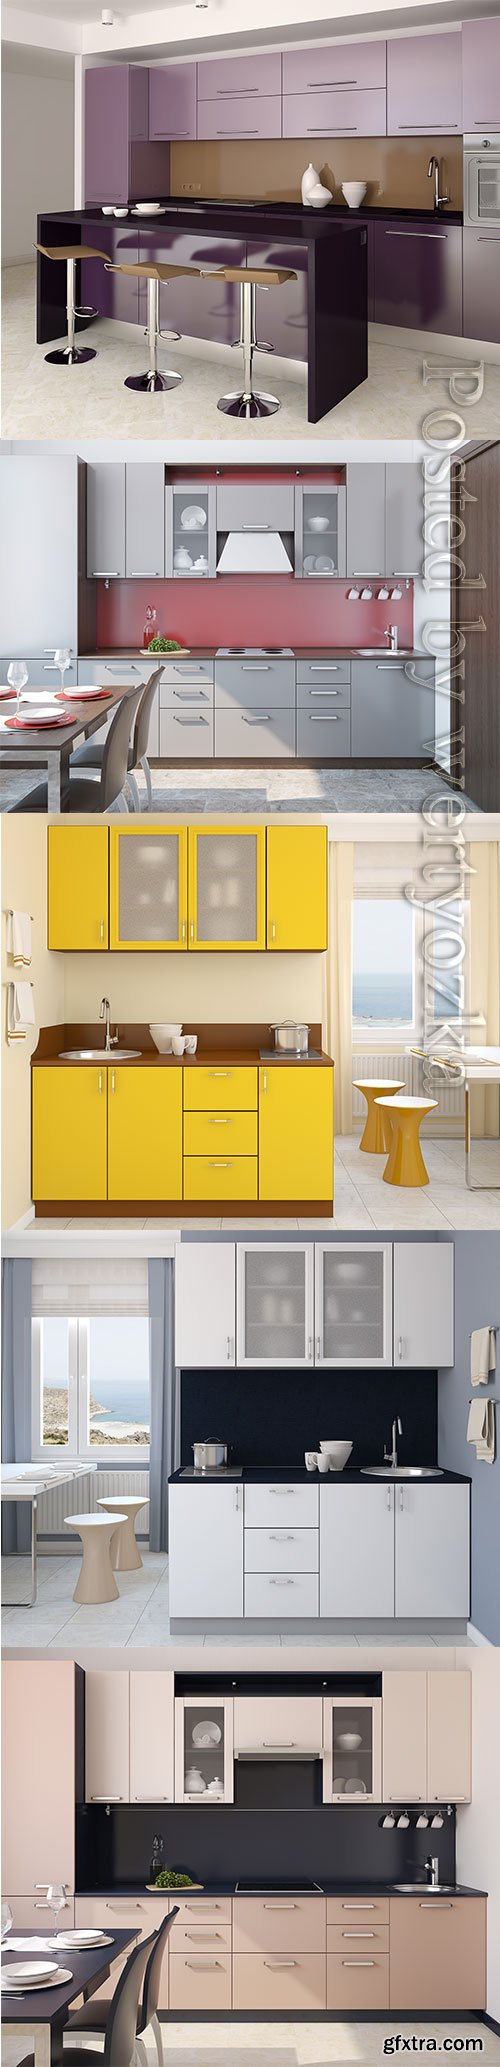 Stylish kitchen interior stock photo